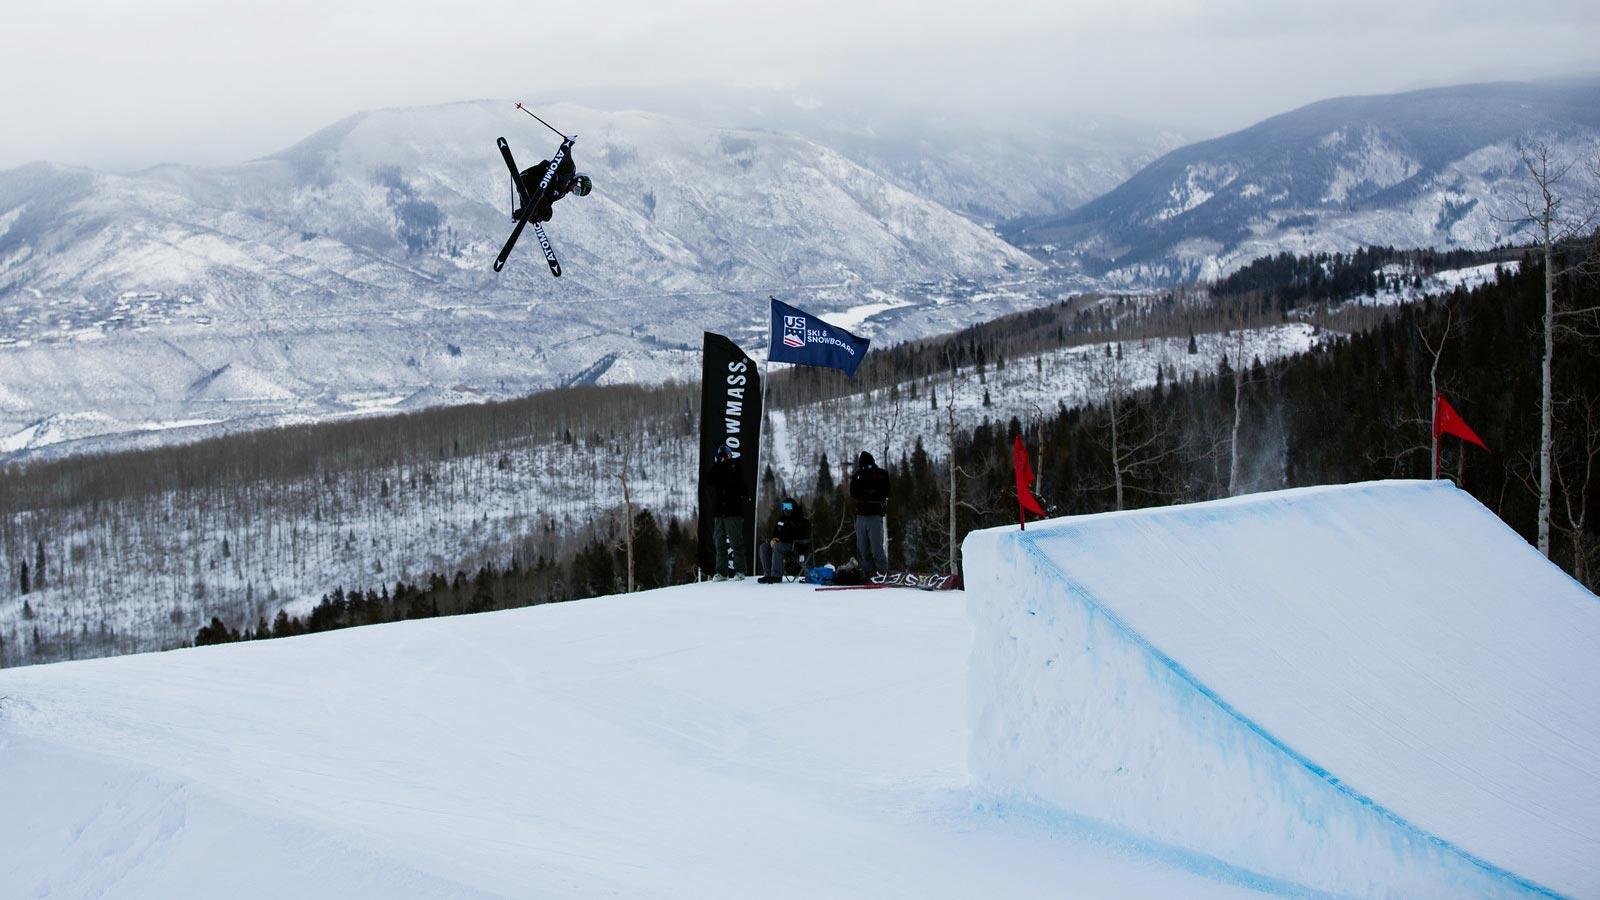 gus_kenworthy_2018_slopestyle_snowmass.jpg